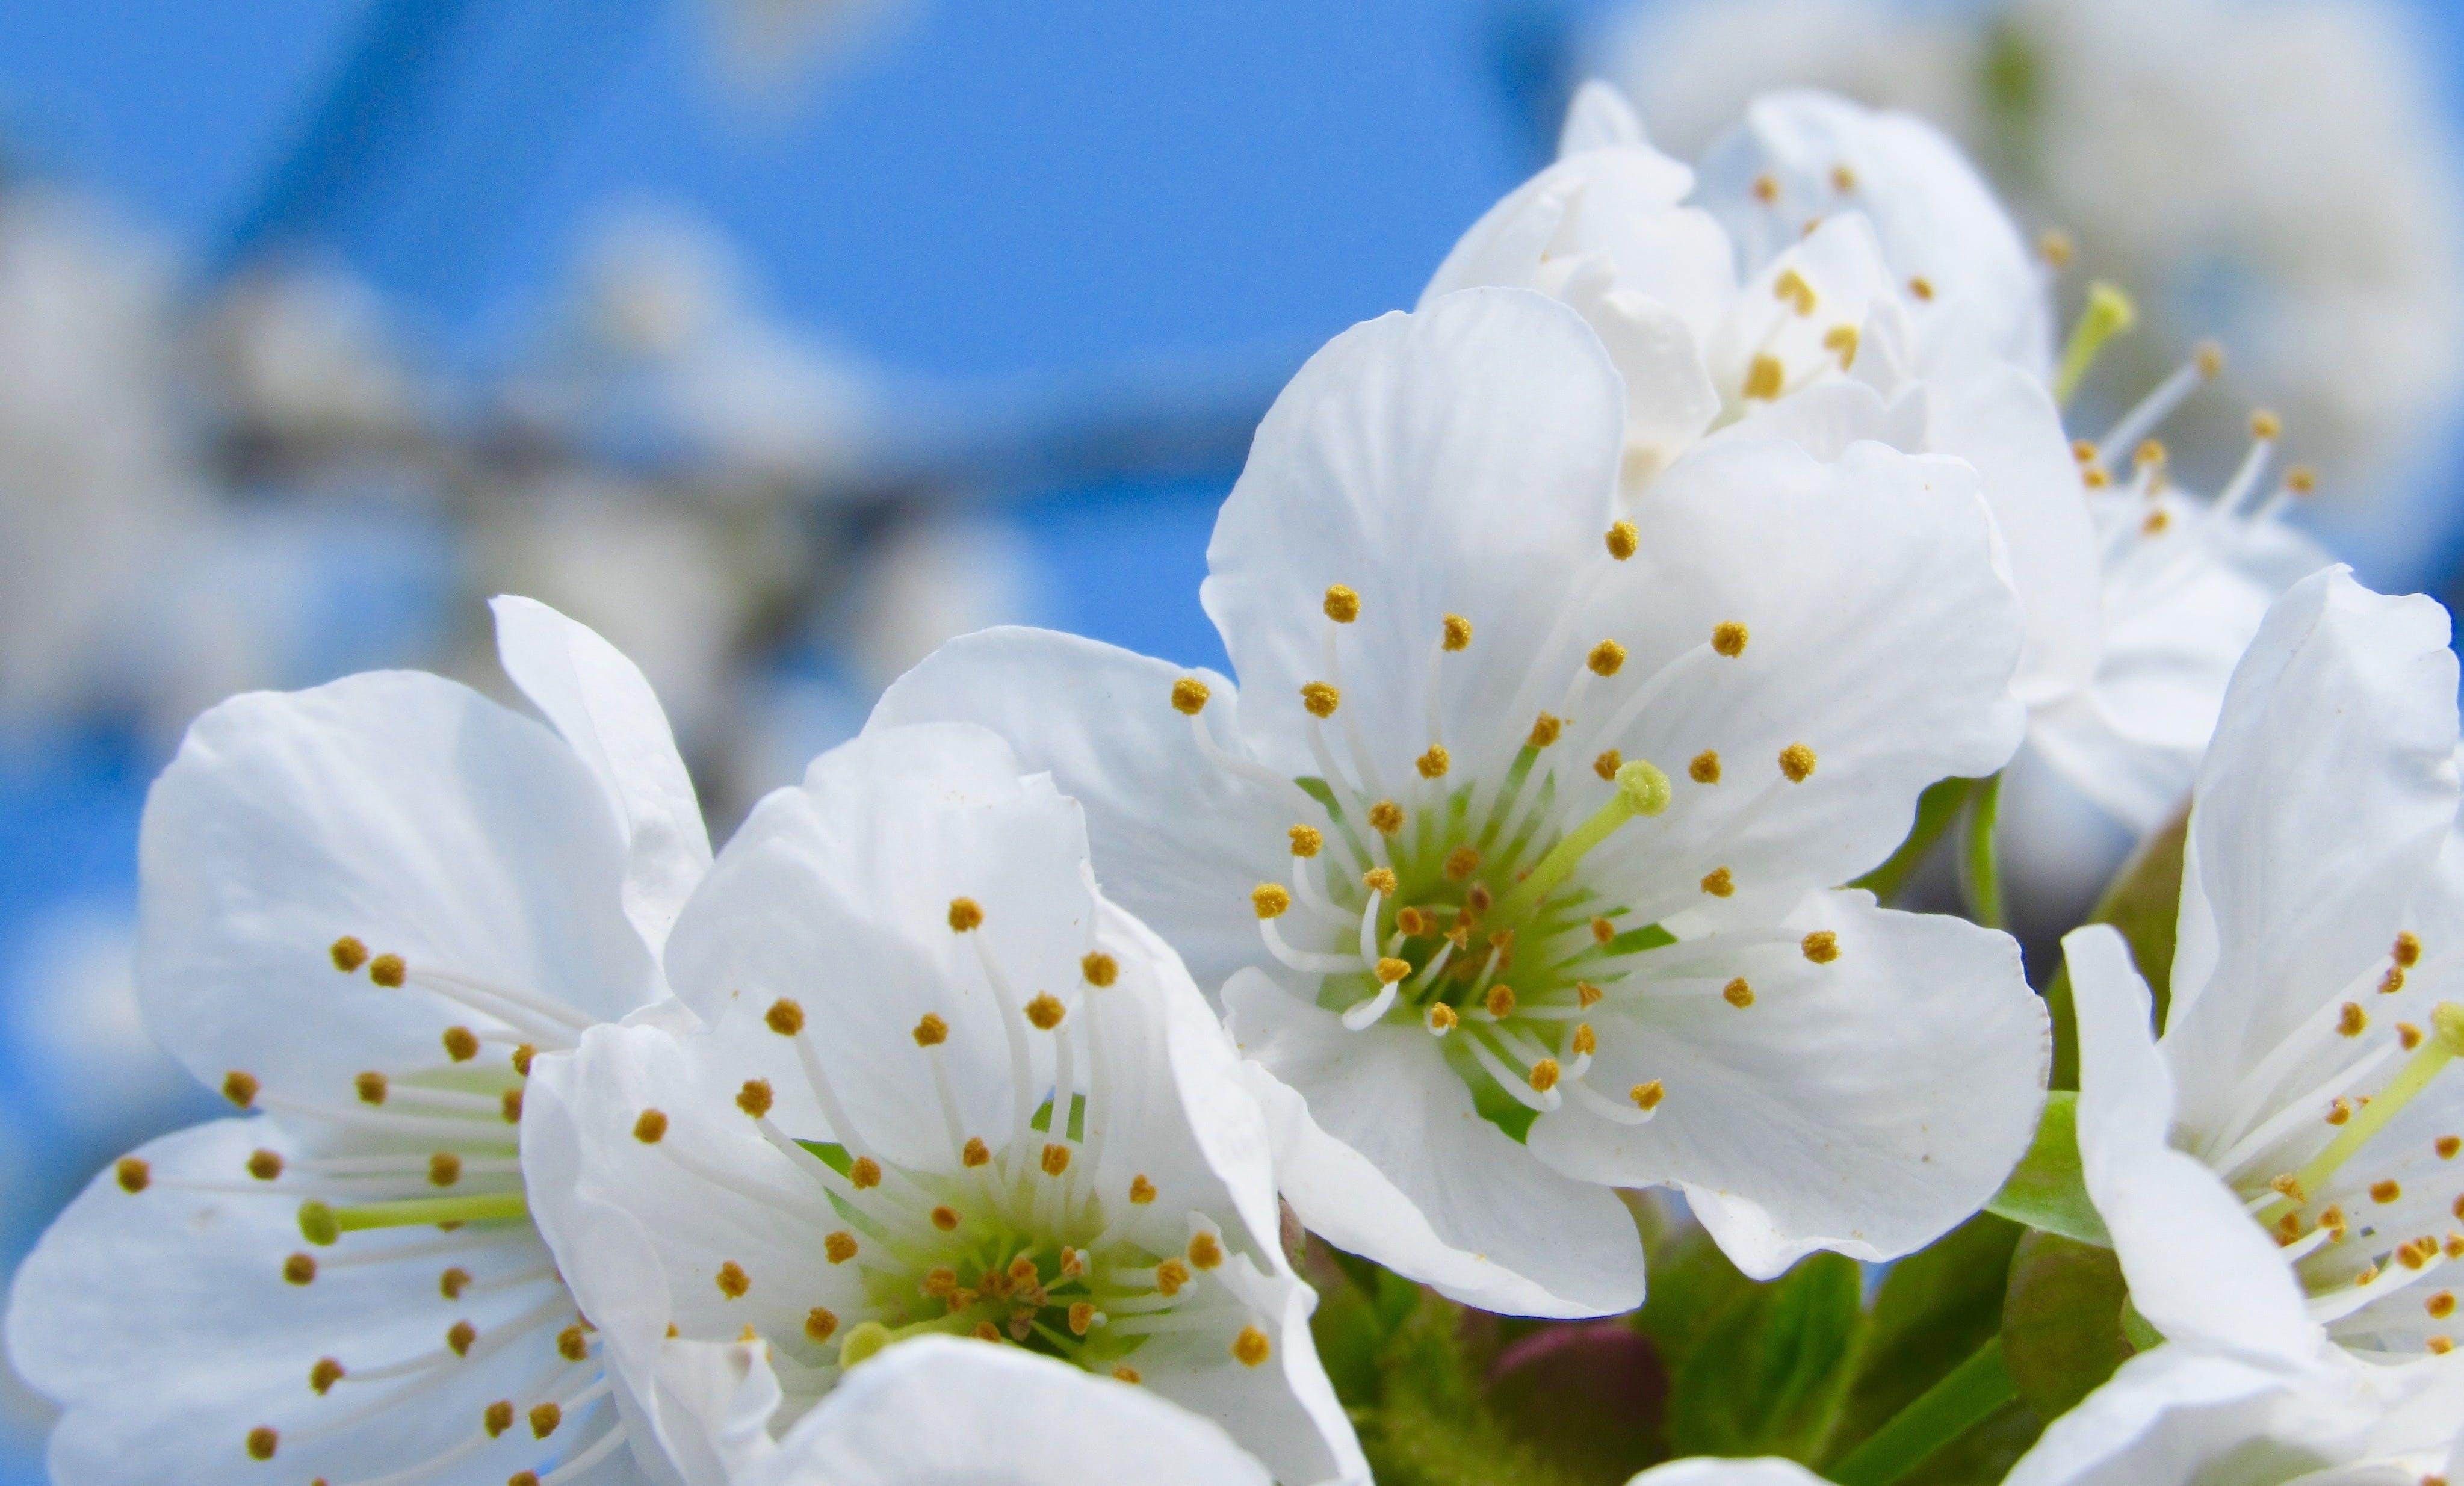 Free stock photo of nature, garden, plant, spring